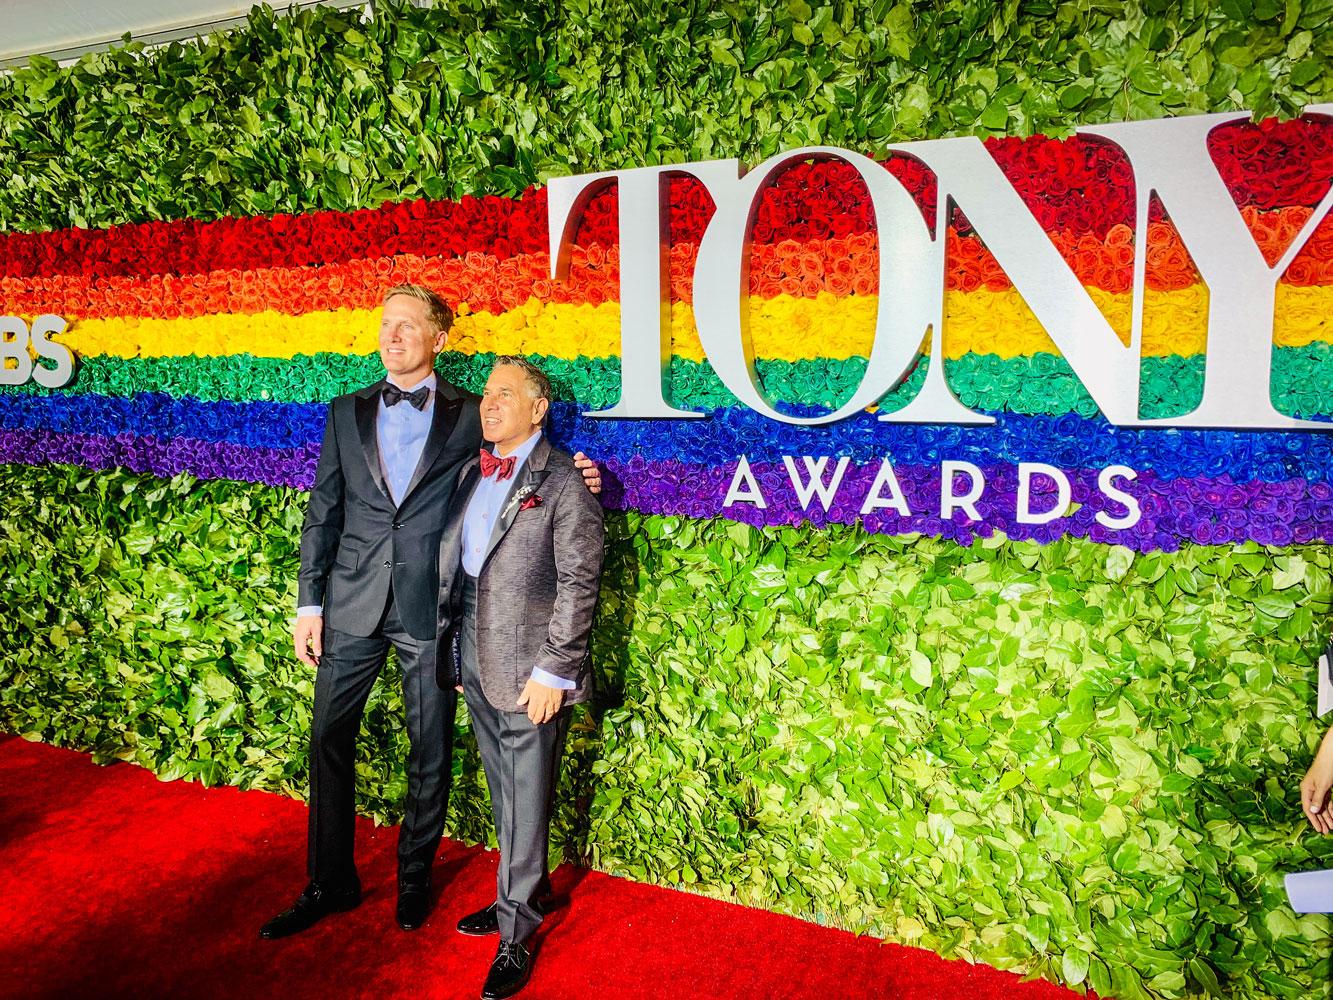 Robert Horn and John Levertt on the 2019 Tony Awards show red carpet.